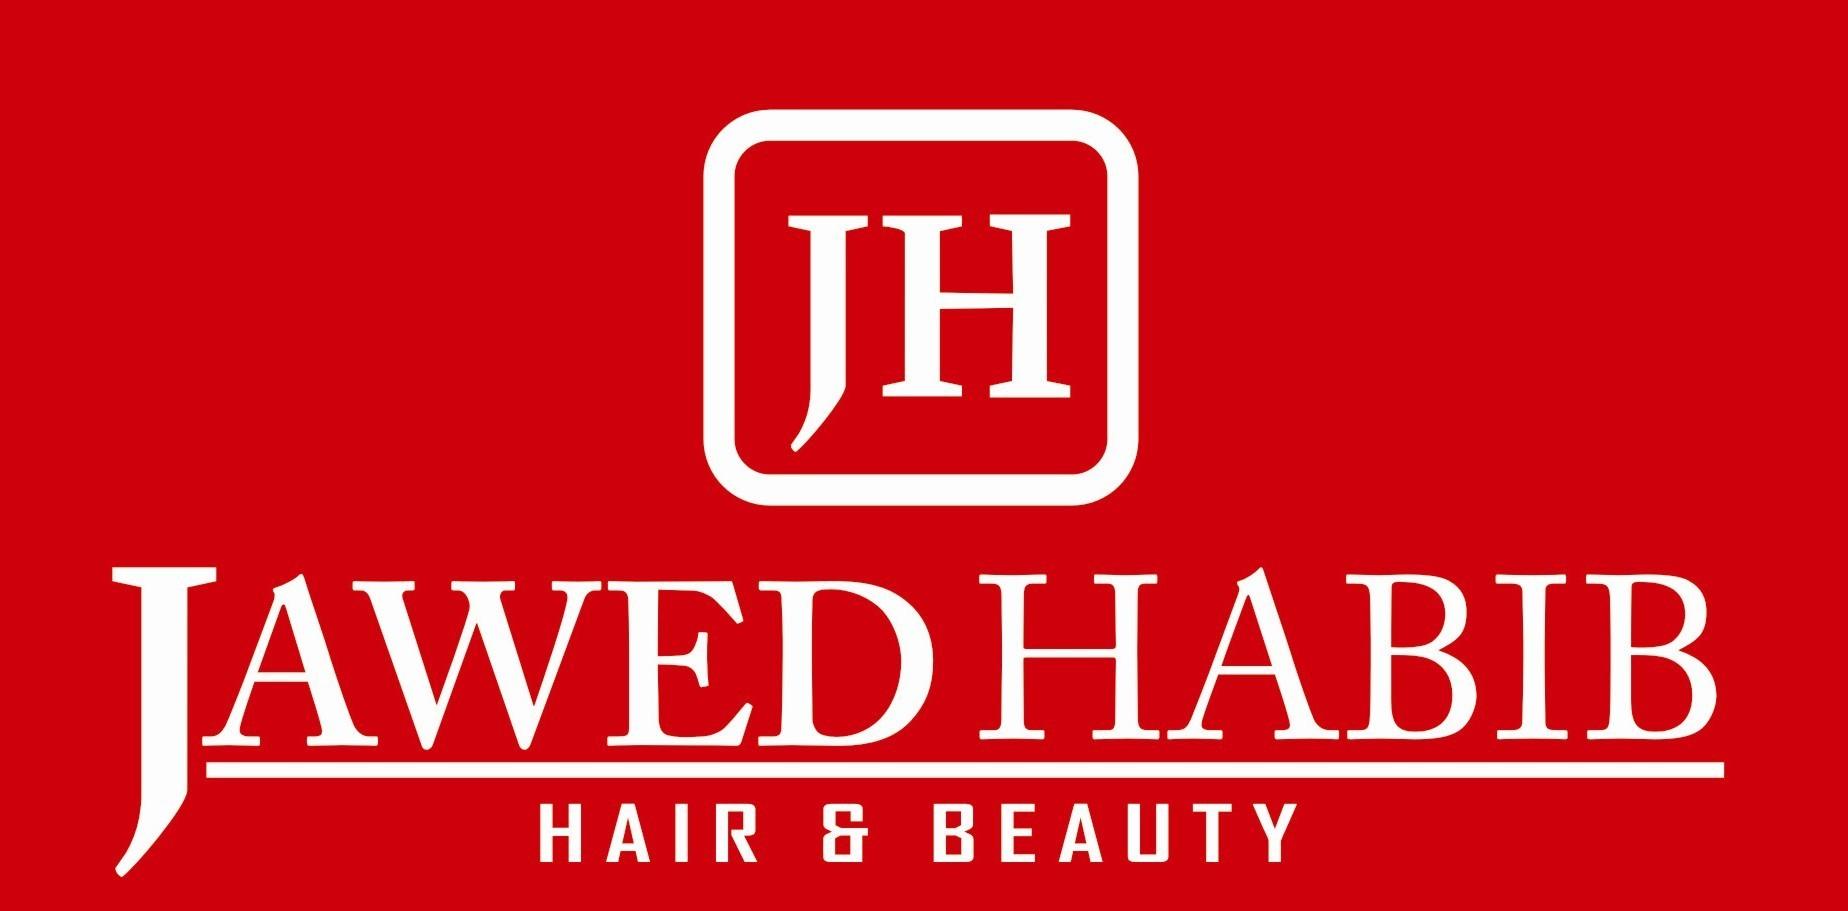 Jawed Habib Hair & Beauty Salons - Adajan - Surat Image